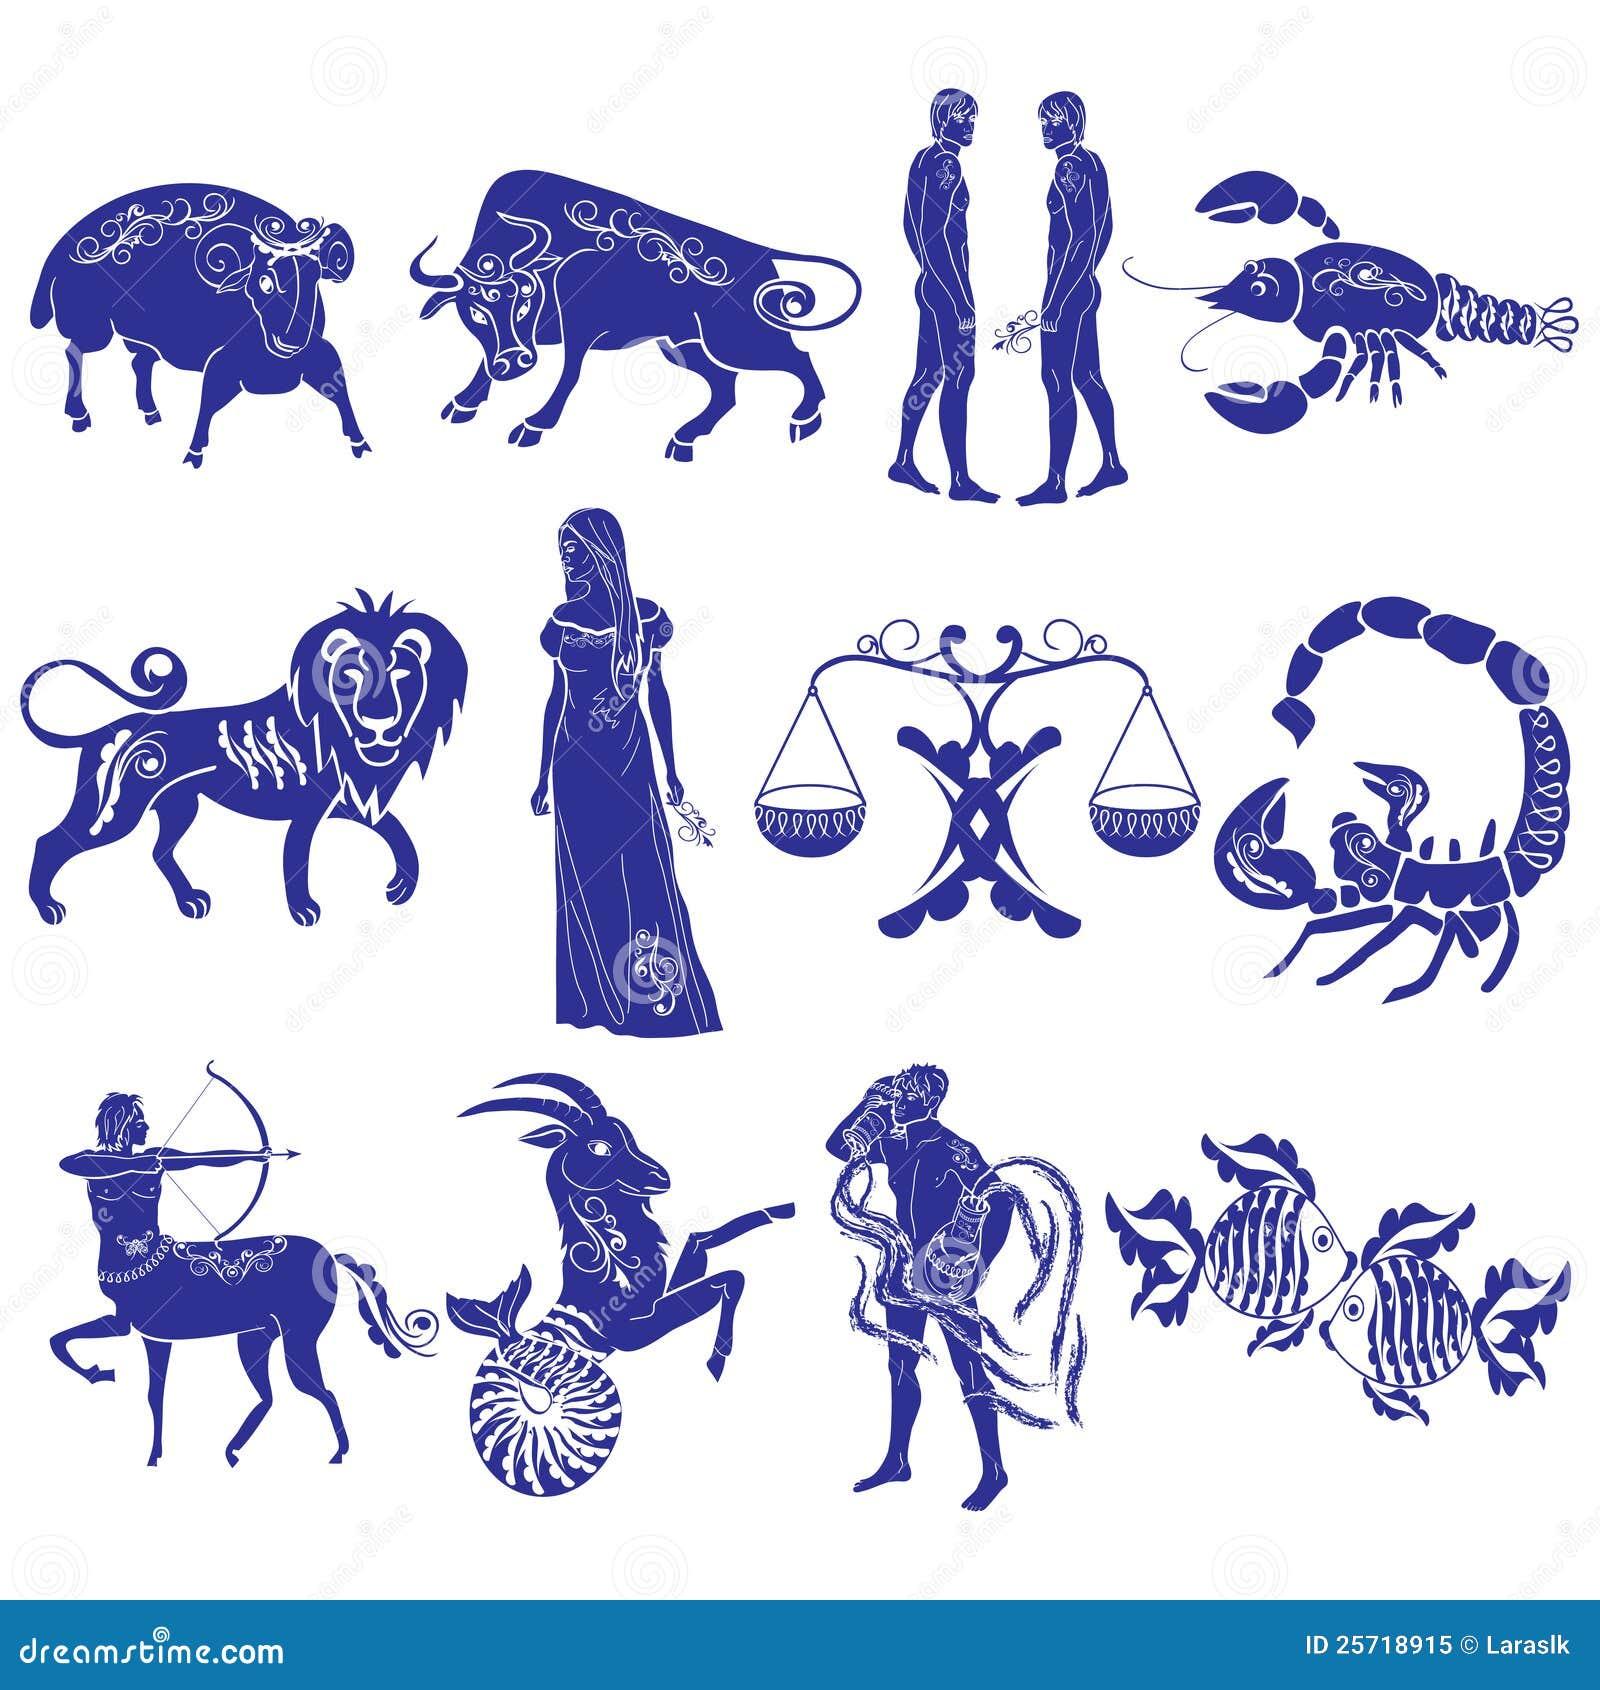 zodiac signs royalty free stock photo image 25718915 zodiac clip art free images zodiac clipart free